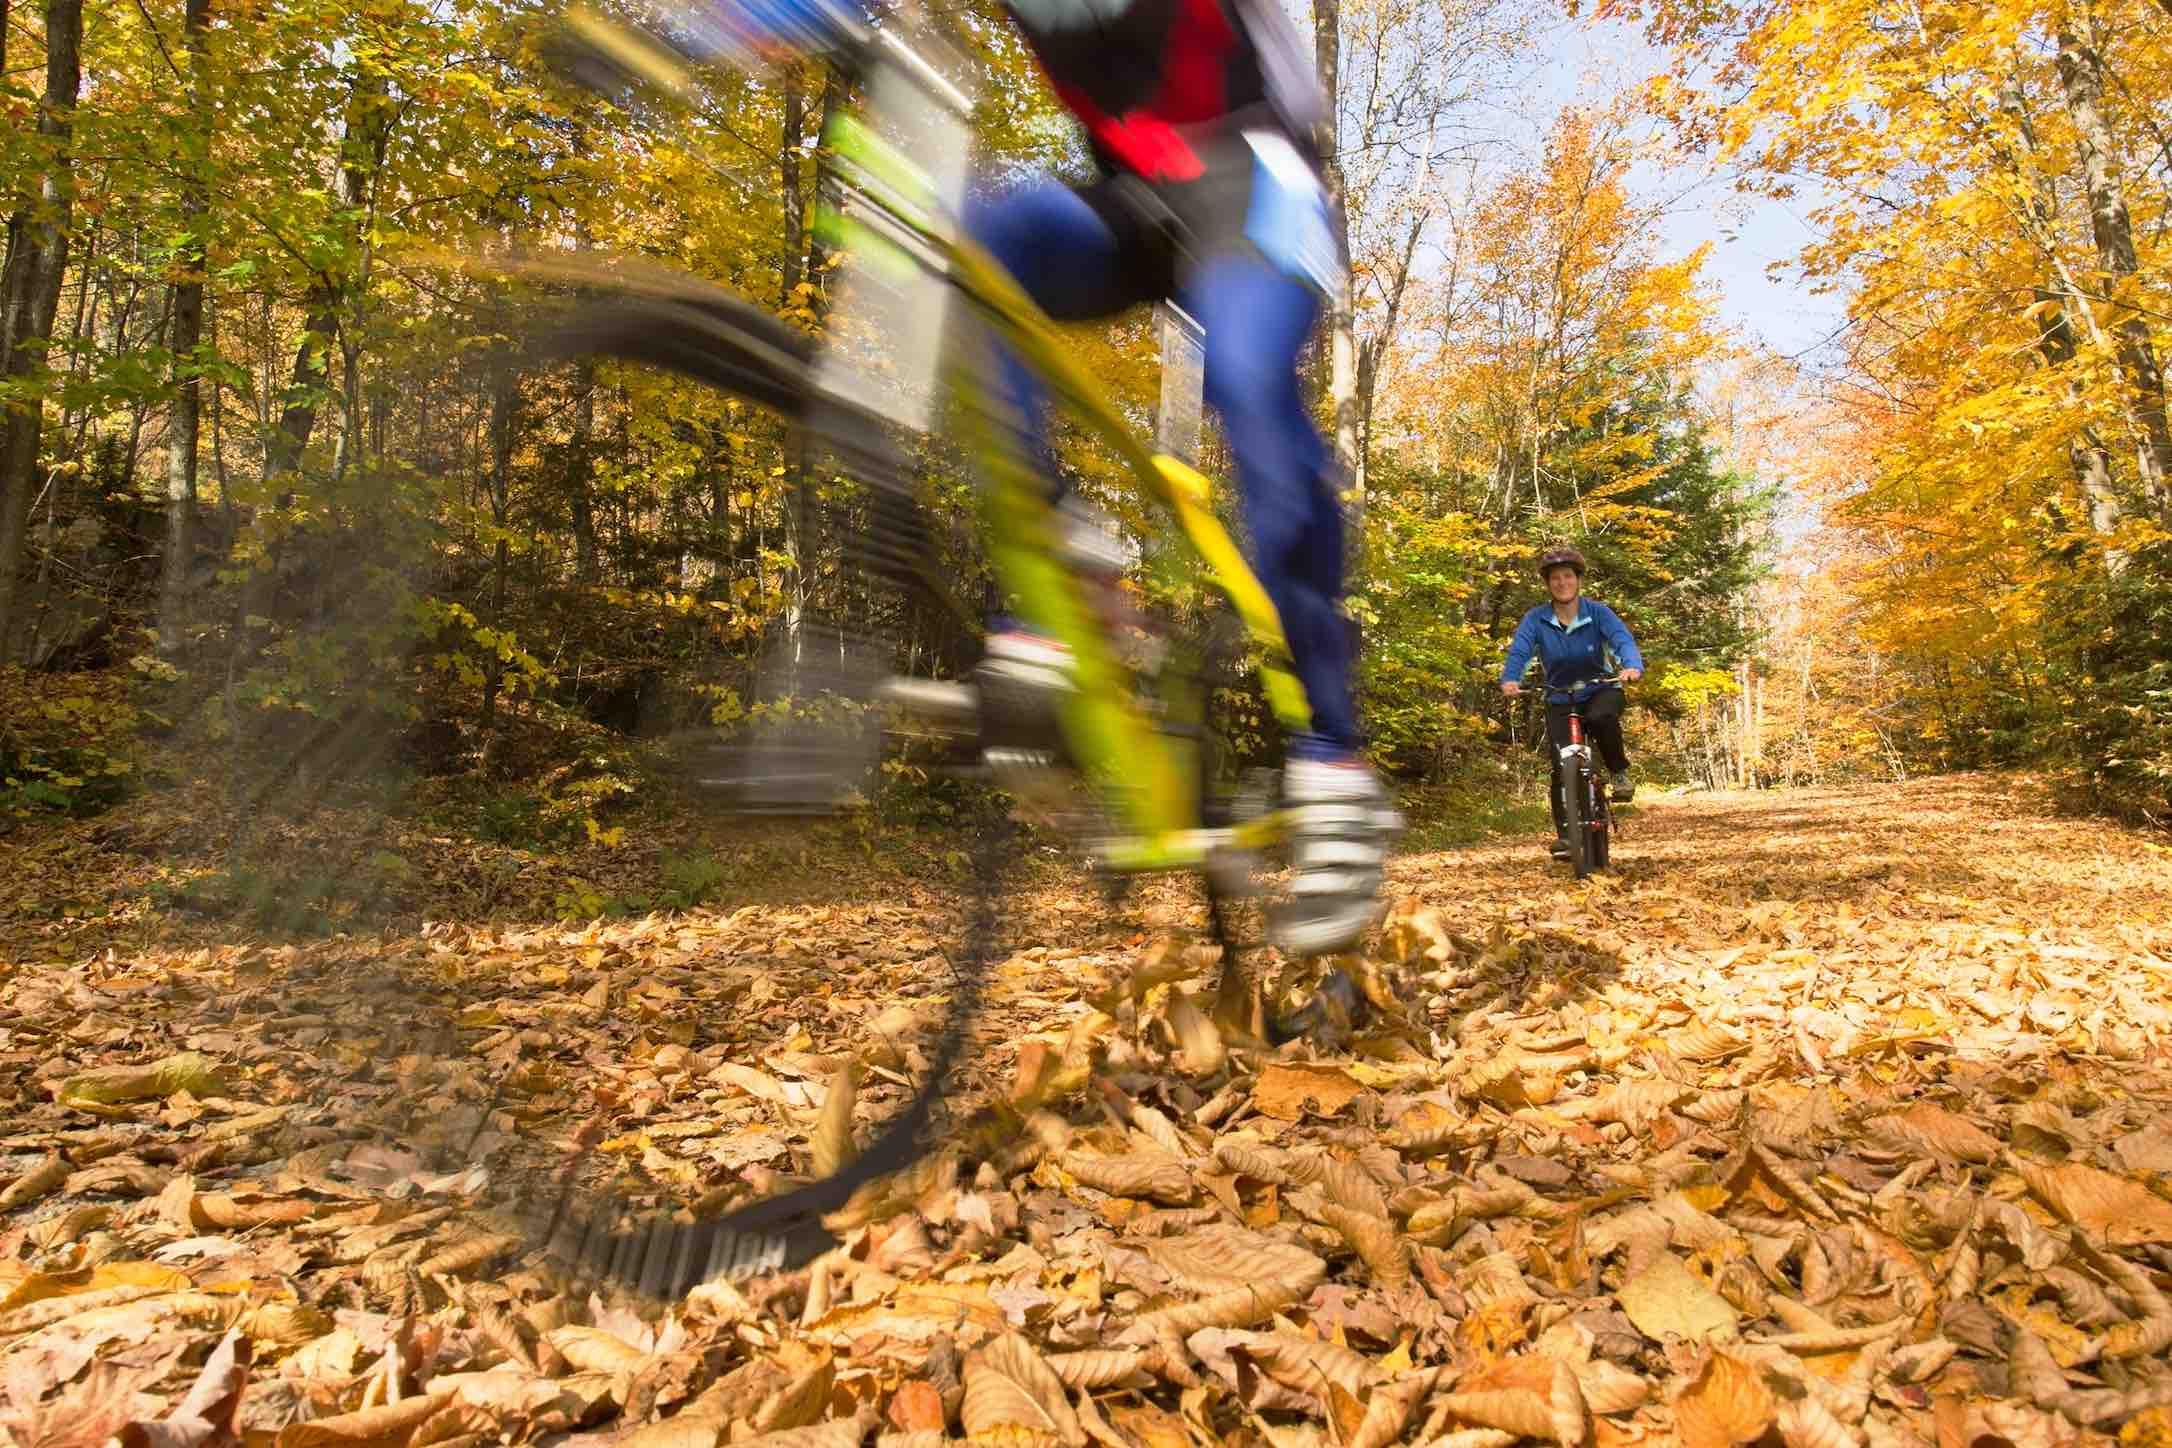 Orillia People Biking on trails in the fall